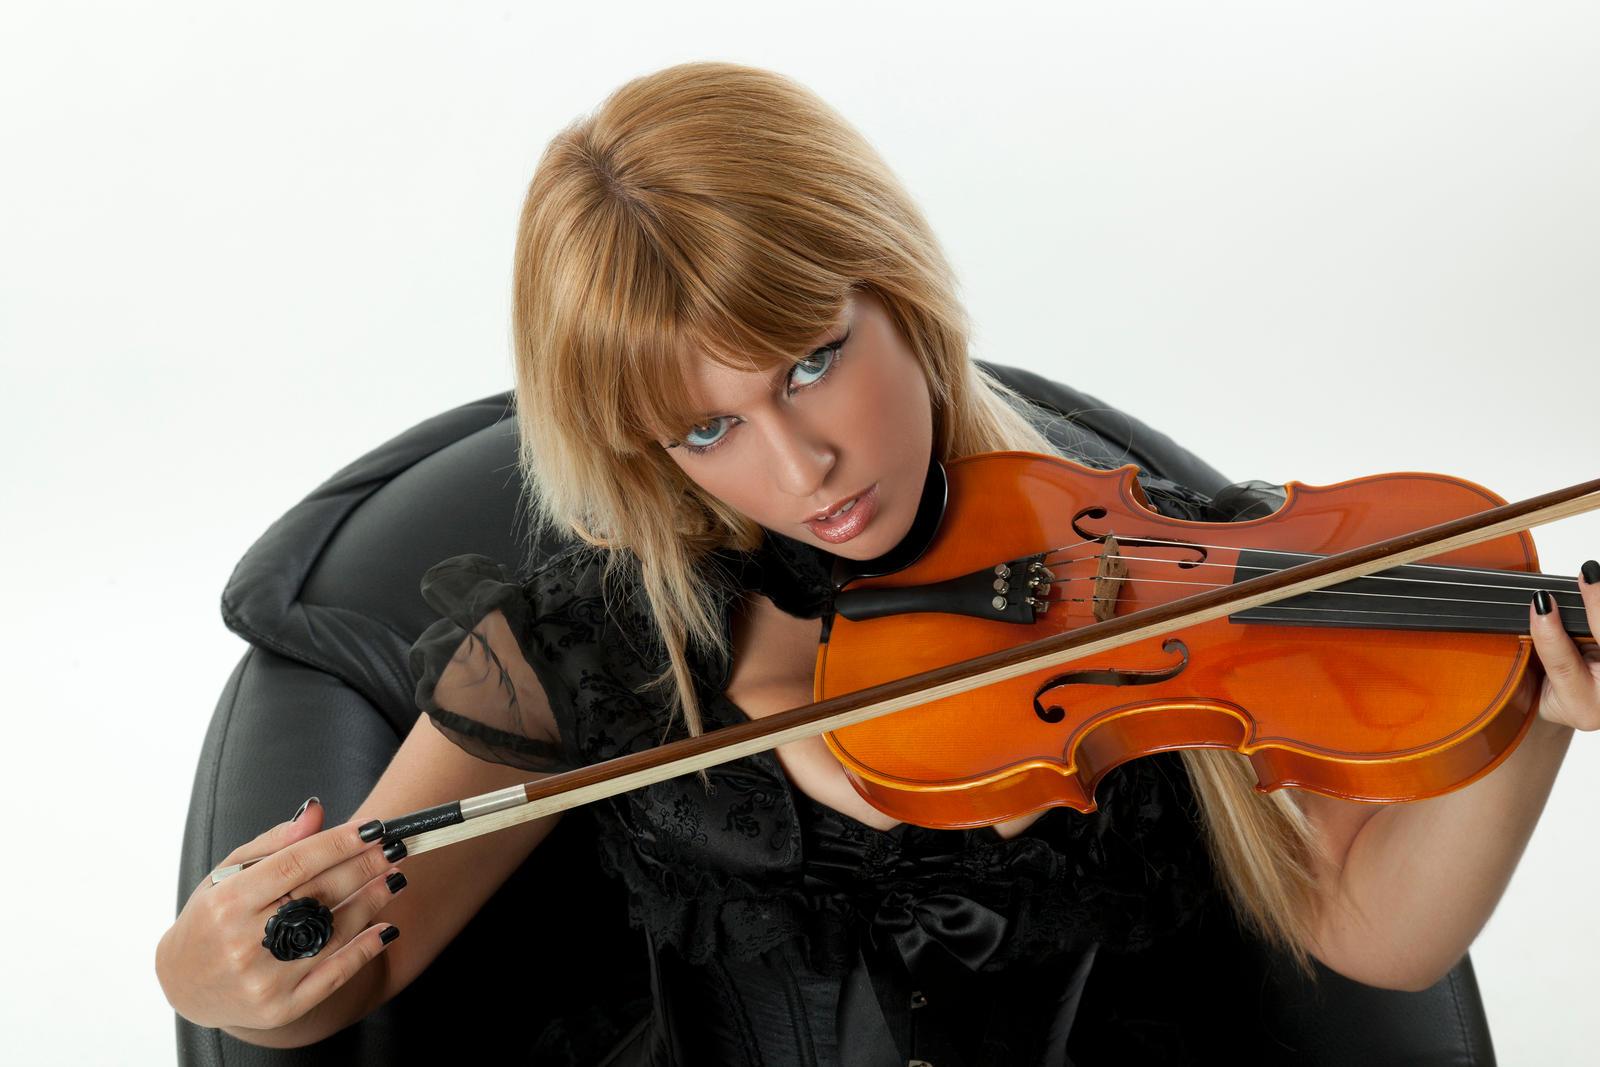 Tanit-Isis Violin close up by tanit-isis-stock